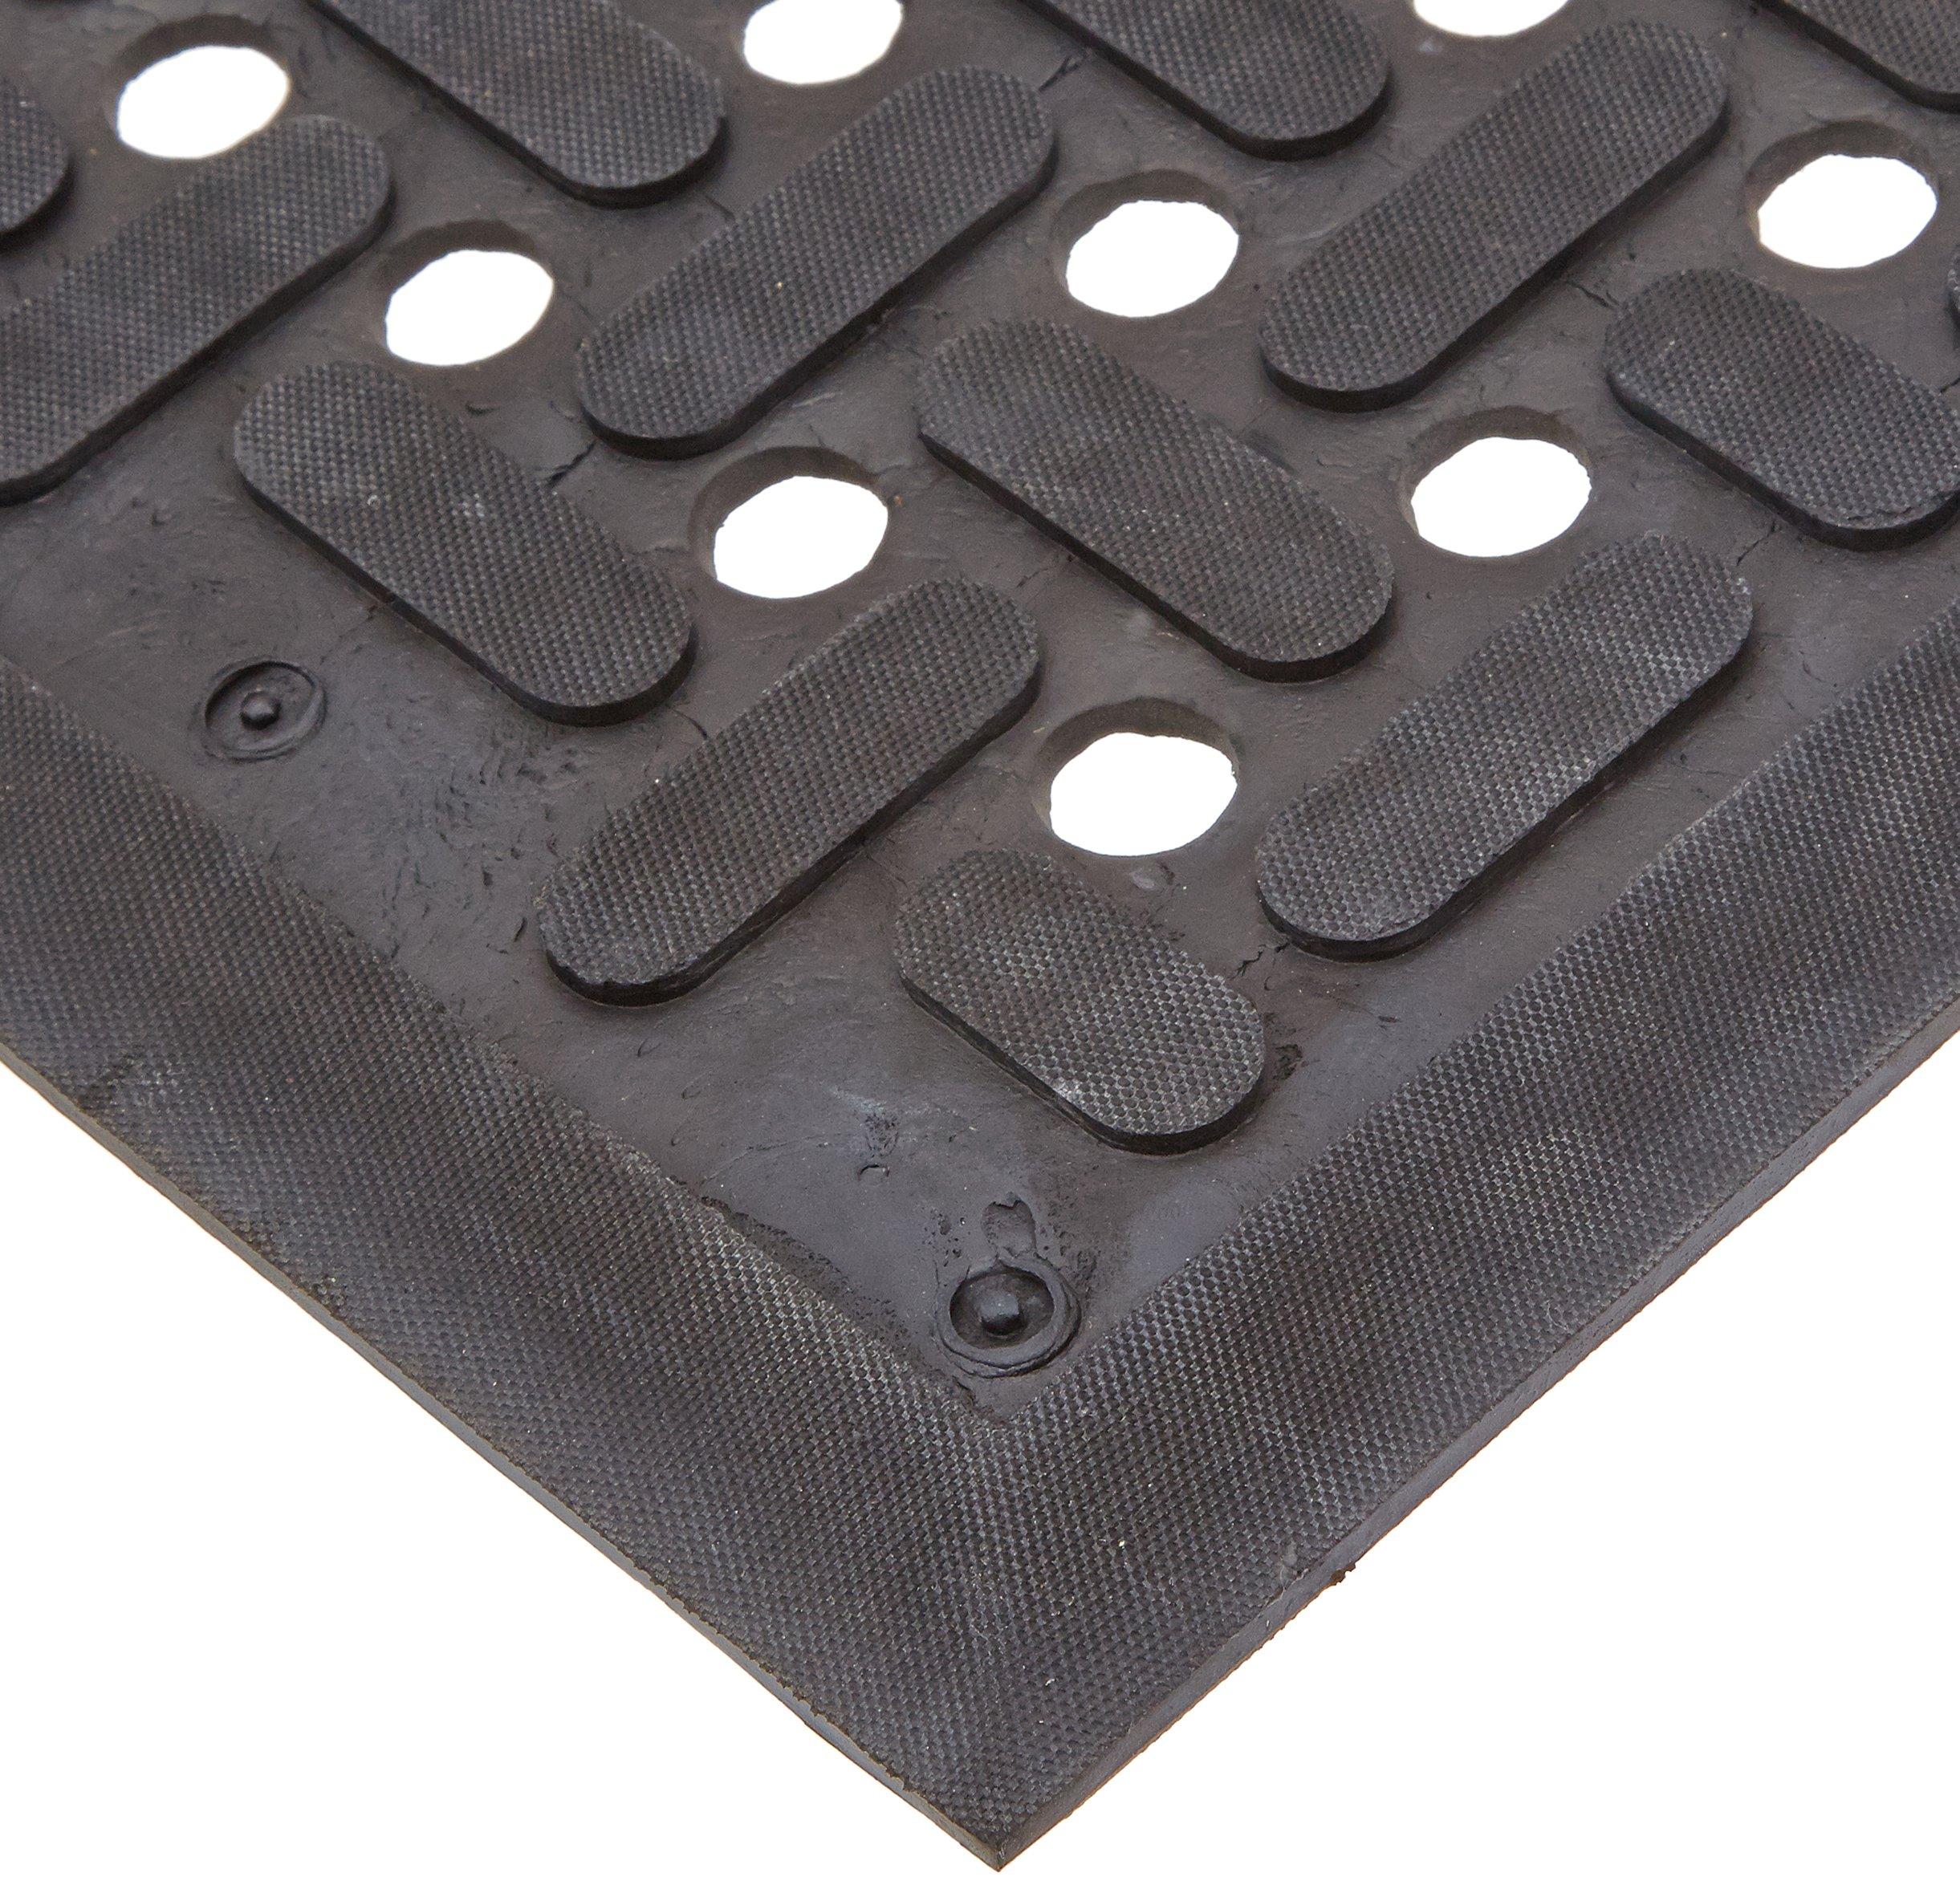 Rhino Mats UM3660 Uni-Mat Resilient Rubber All Purpose Entry Mat, 3' Width x 5' Length x 3/8'' Thickness, Black